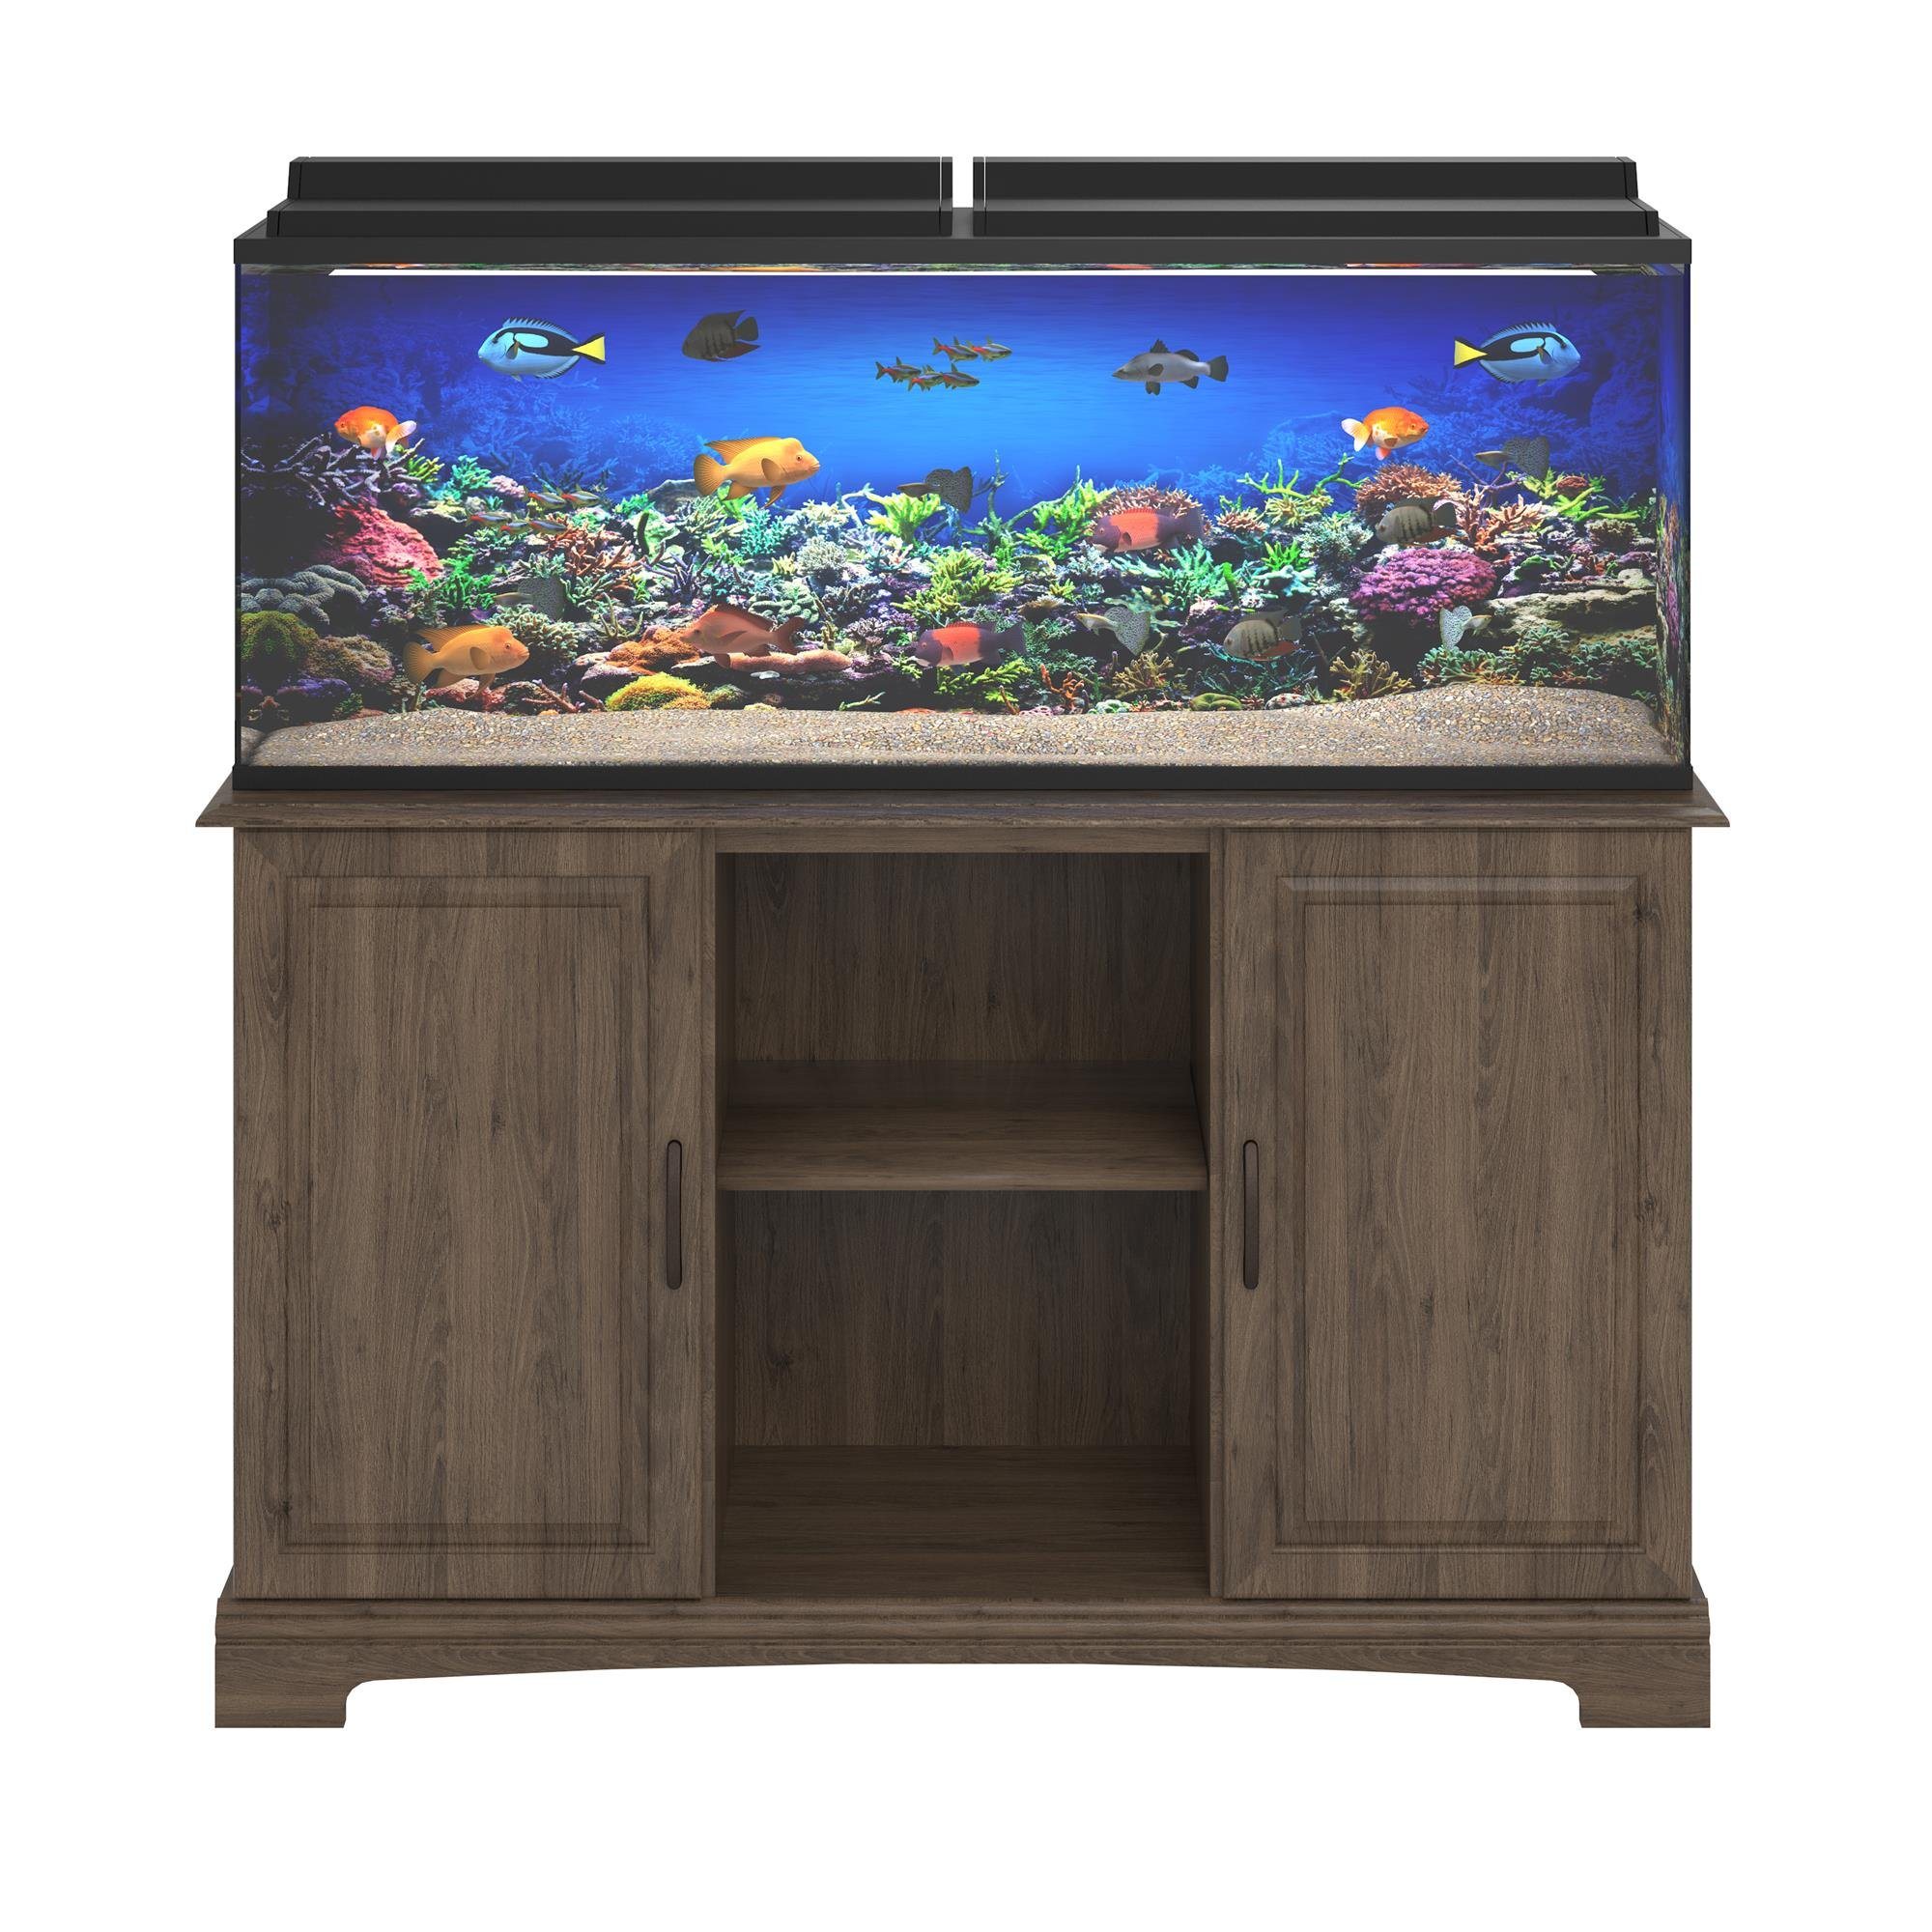 Ameriwood Home Harbor 50 - 75 Gallon Aquarium Stand, Rustic Oak by Ameriwood Home